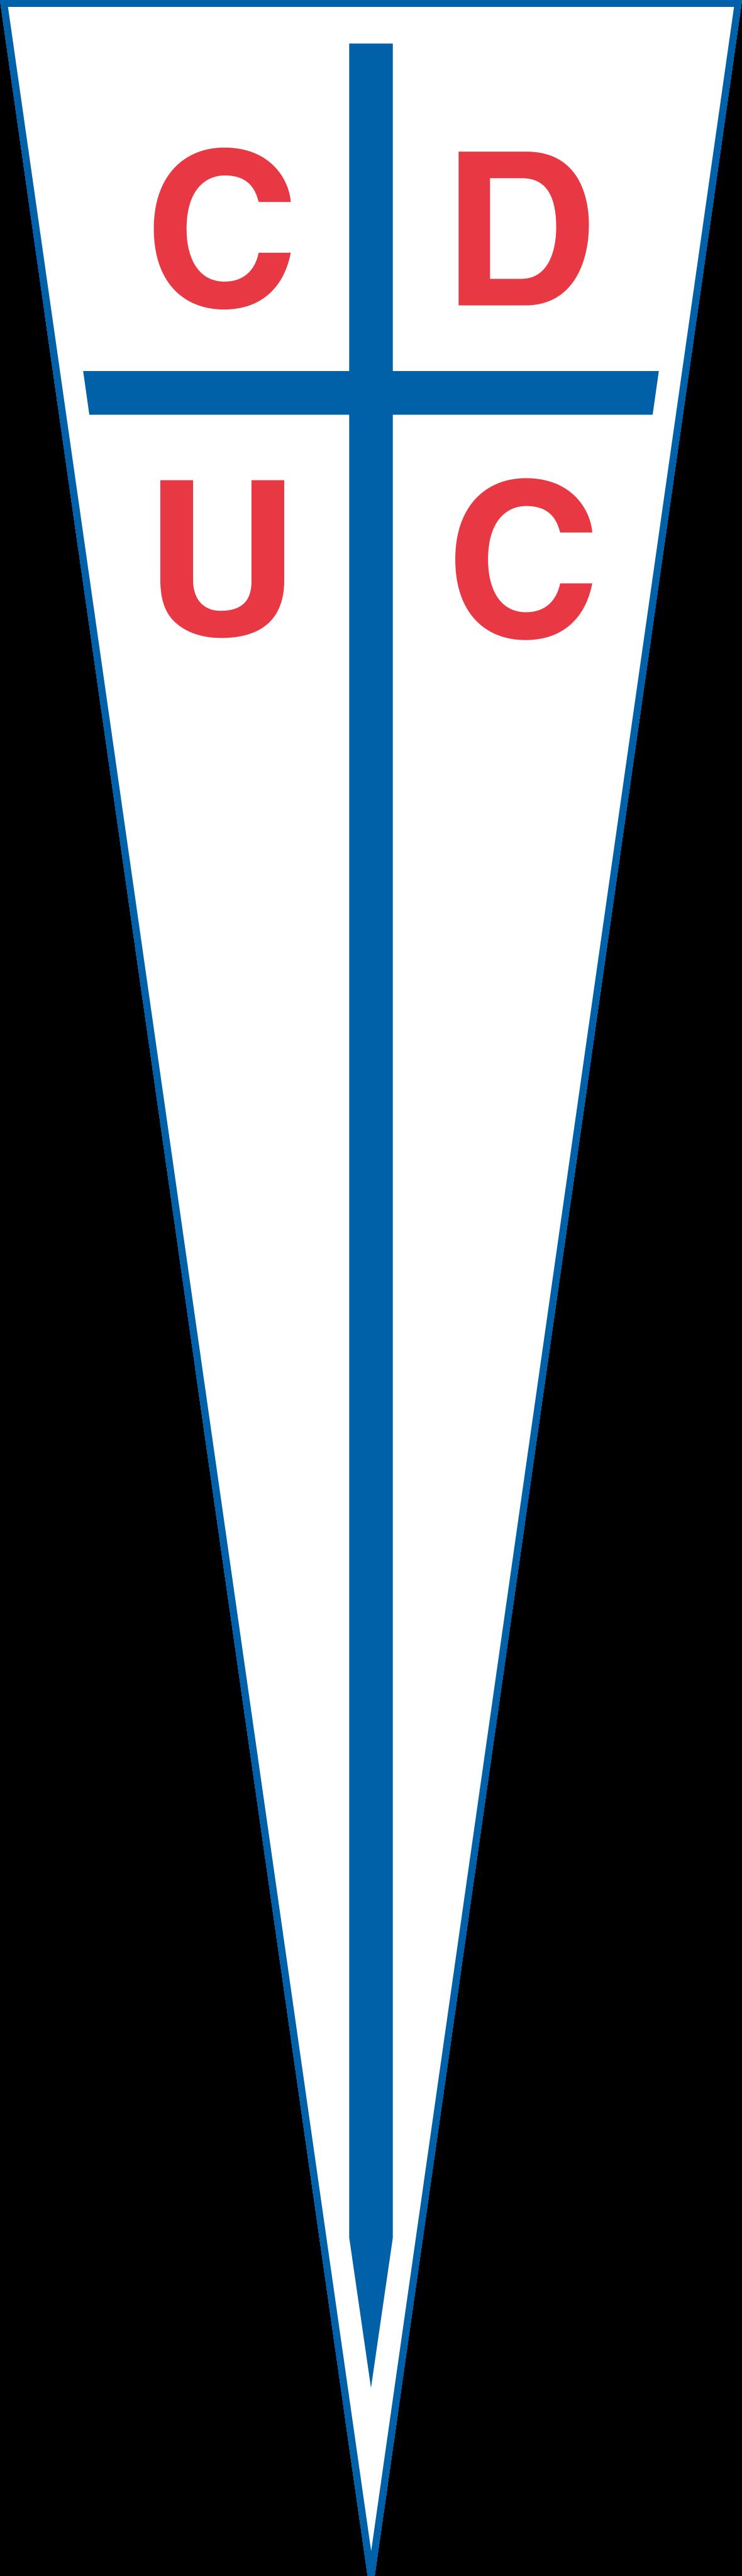 universidad catolica logo - Universidad Católica Logo